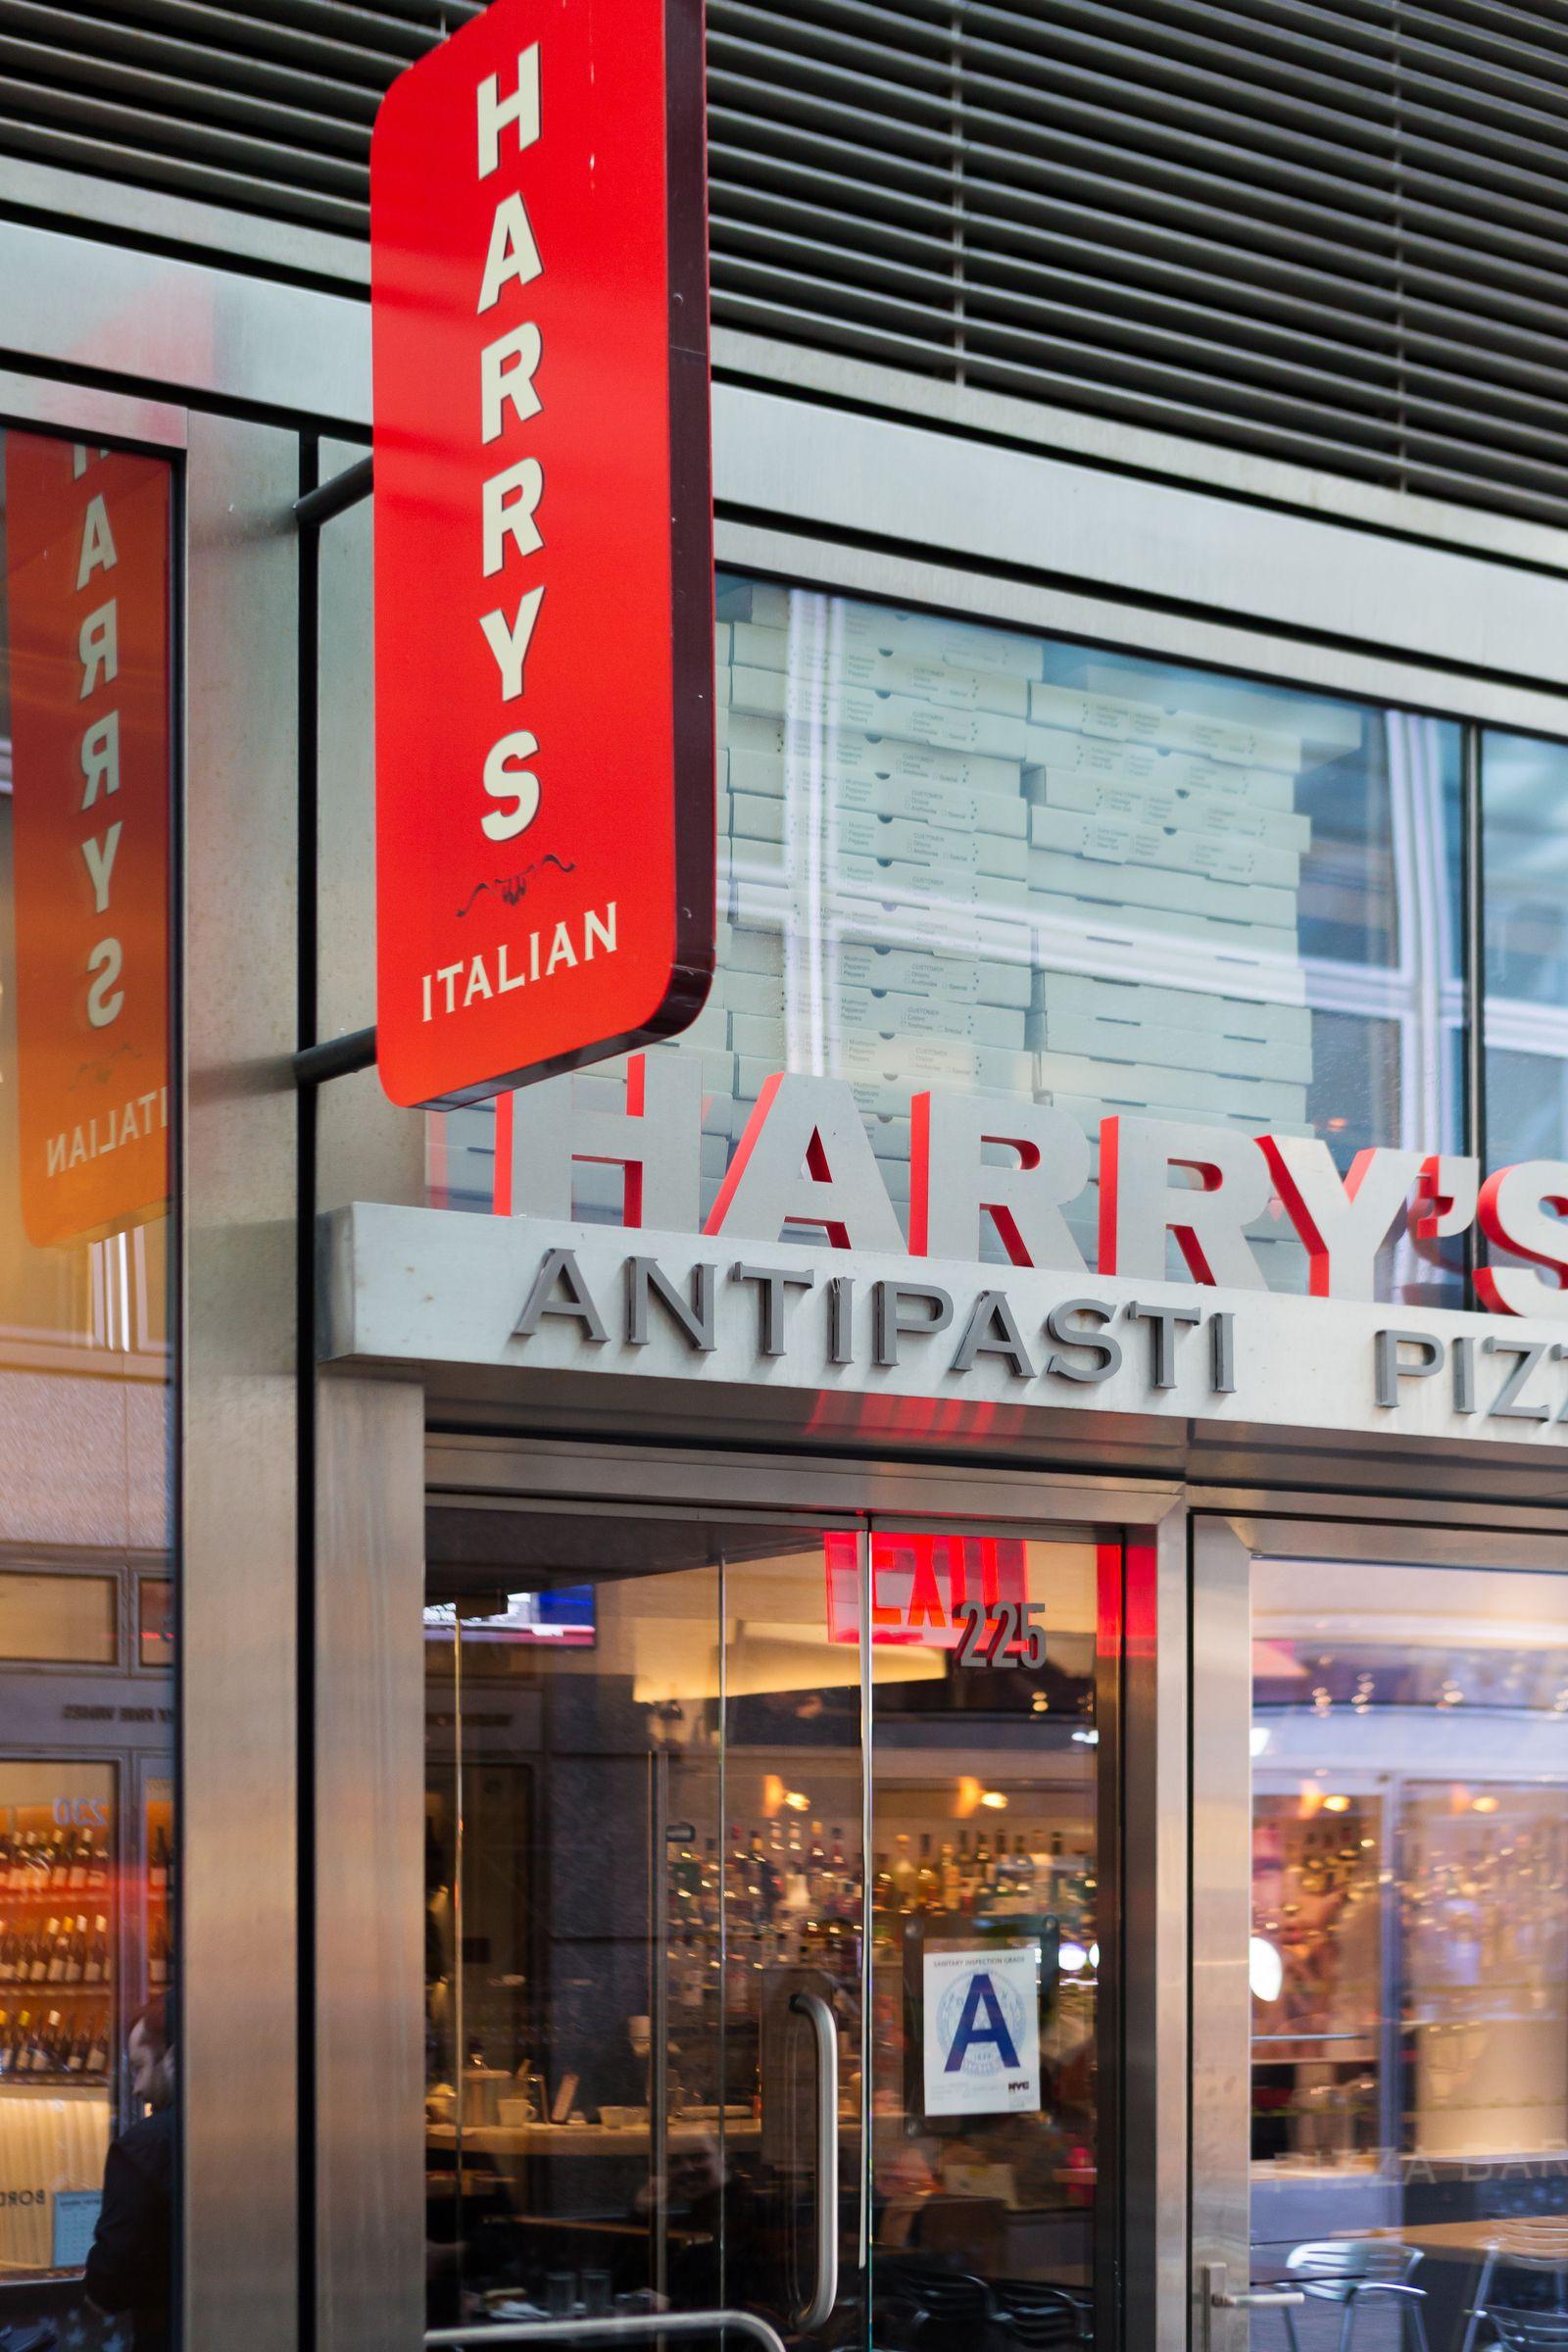 Harry S Italian Italian Broadway Shows Antipasti